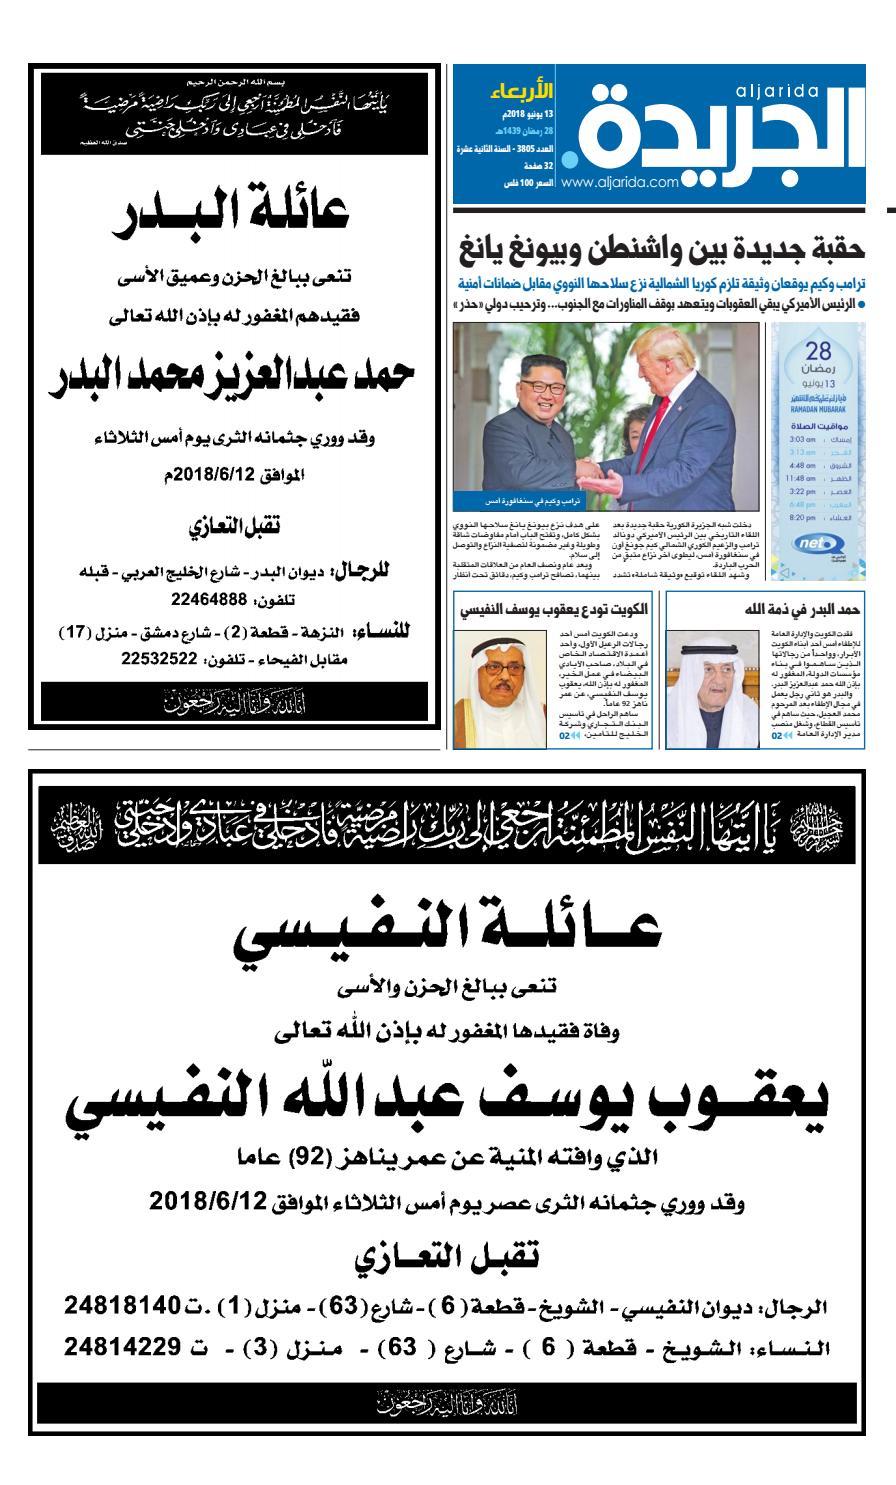 a5d8153d2b971 عدد الجريدة الأربعاء 13 يونيو 2018 by Aljarida Newspaper - issuu